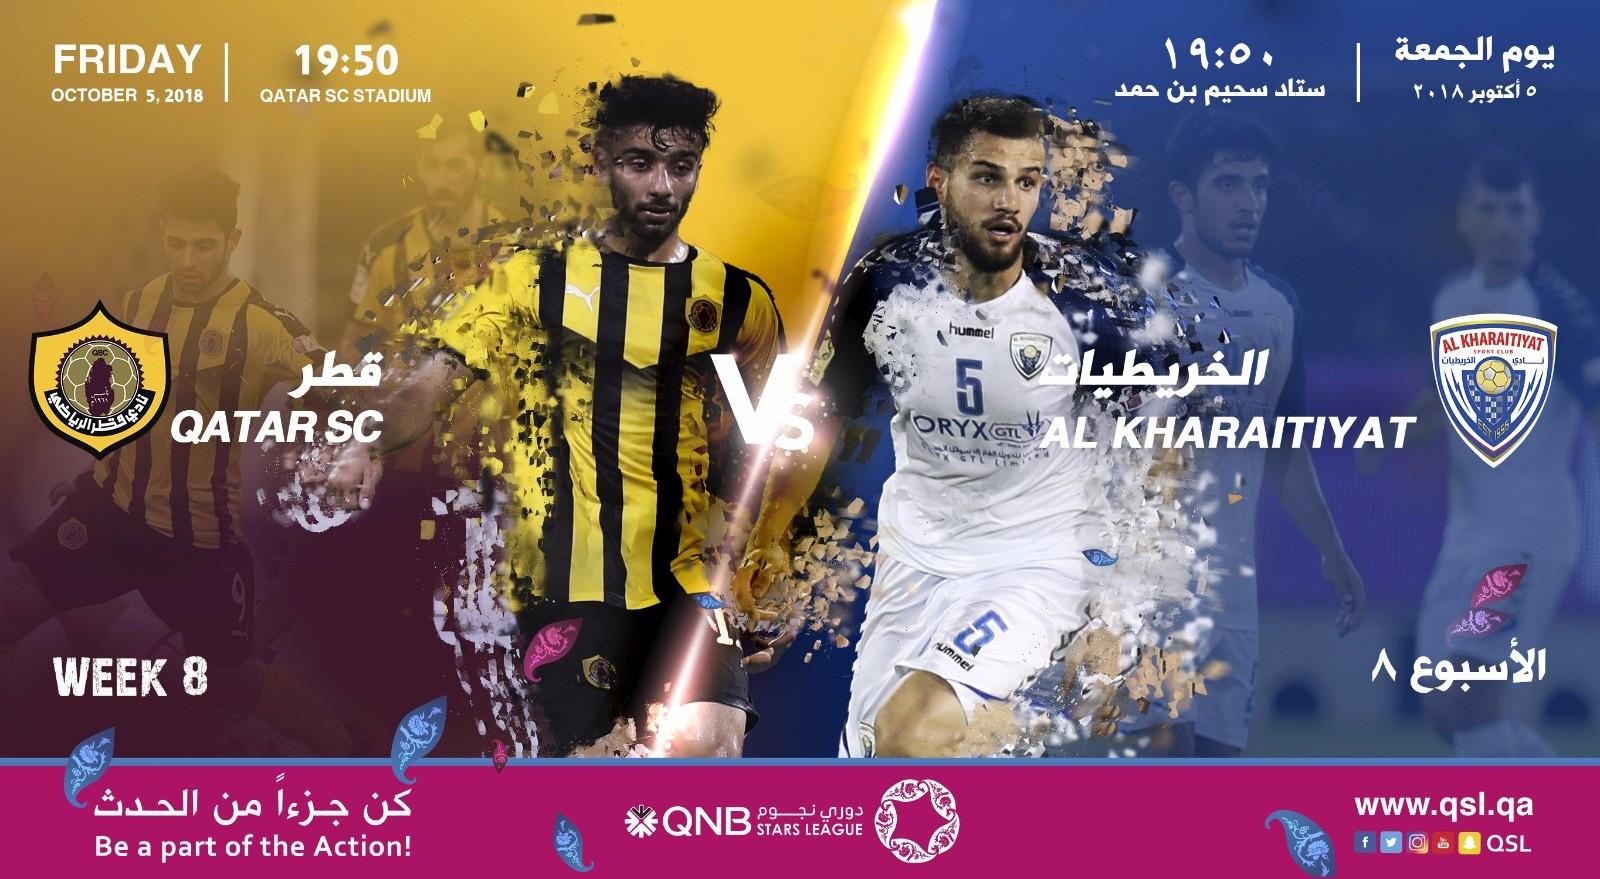 Qatar SC, Al Kharaitiyat seek second win